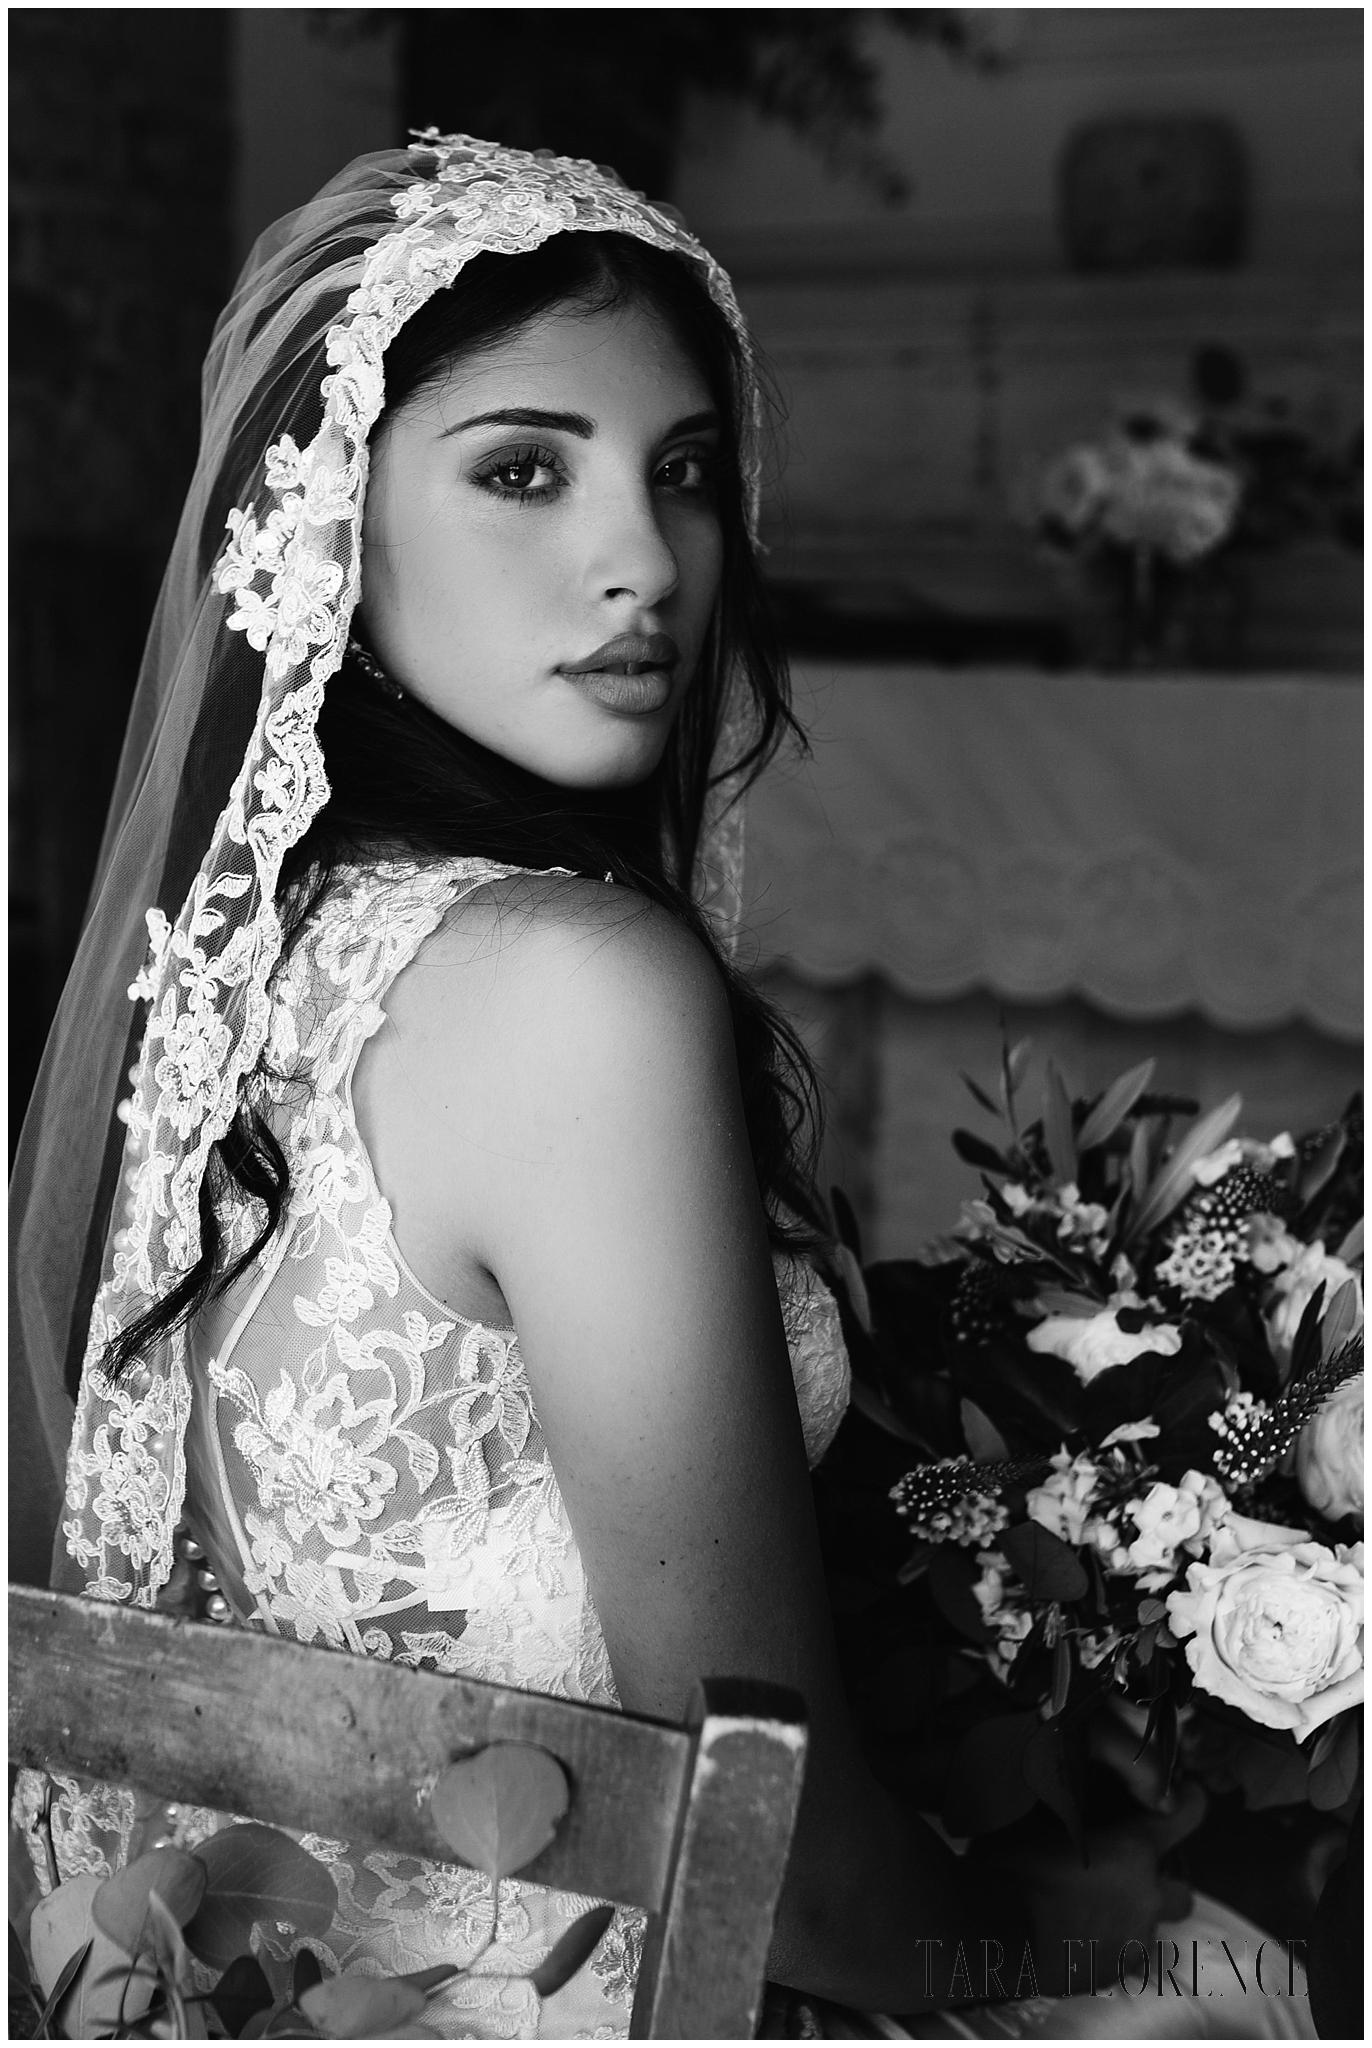 Puglia-Tara-Florence-Bridal-Editorial-148_WEB.jpg